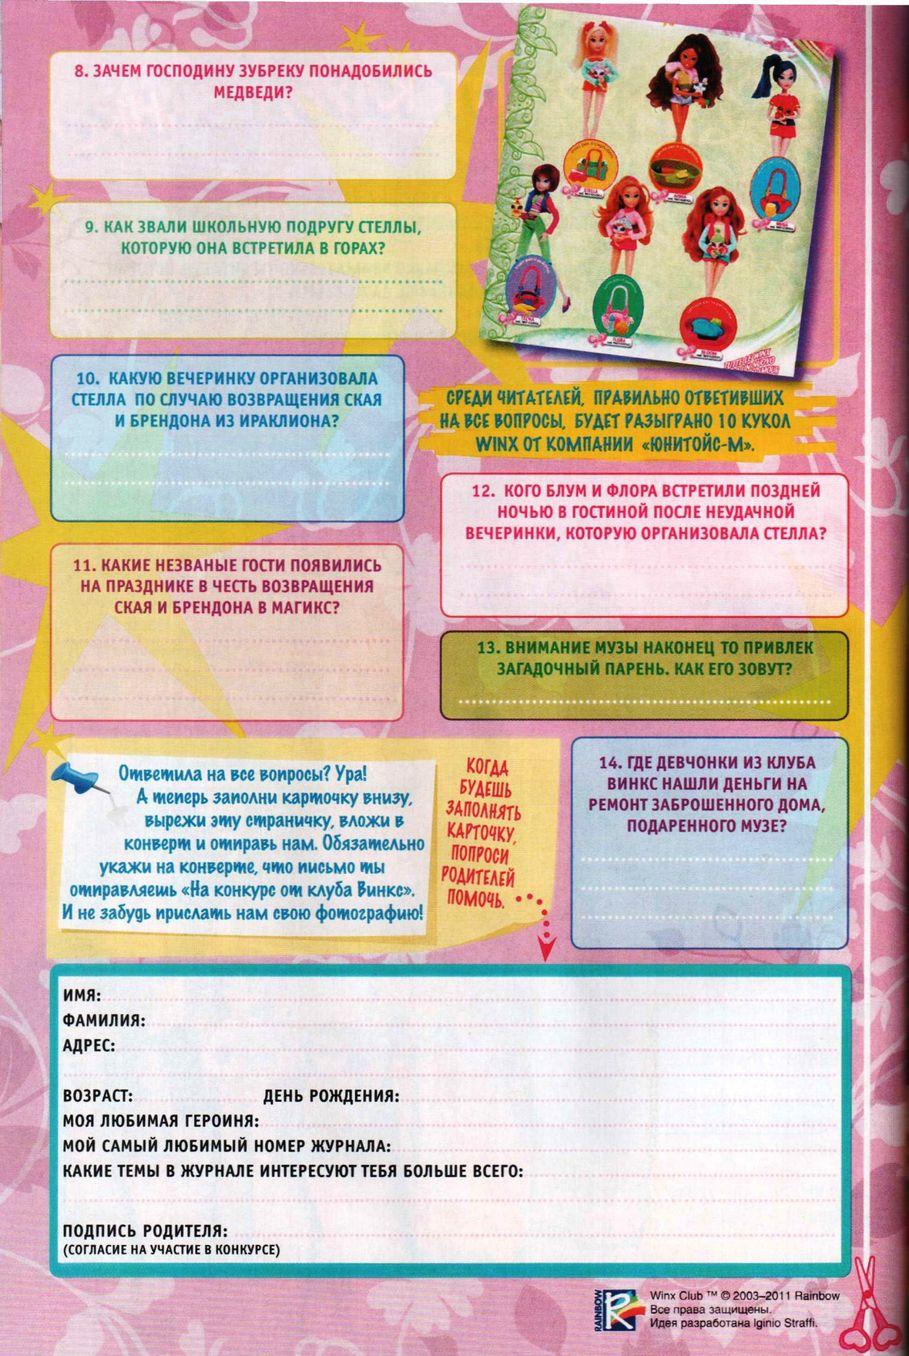 Комикс Винкс Winx - Опасный замысел (Журнал Винкс №10 2011) - стр. 59